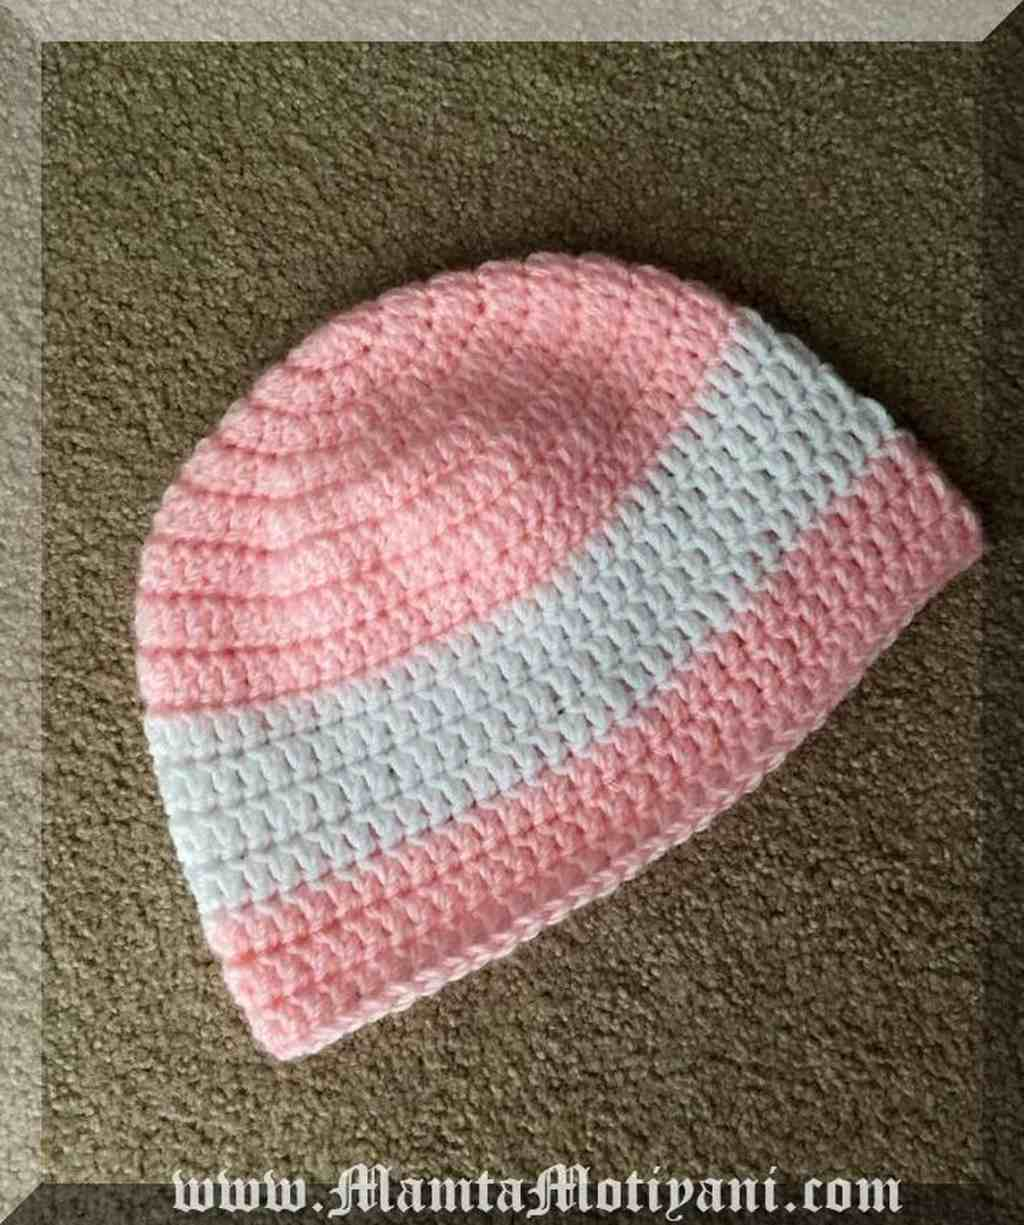 Free Chemo Beanie Crochet Hat Pattern Unique Easy Crochet Patterns